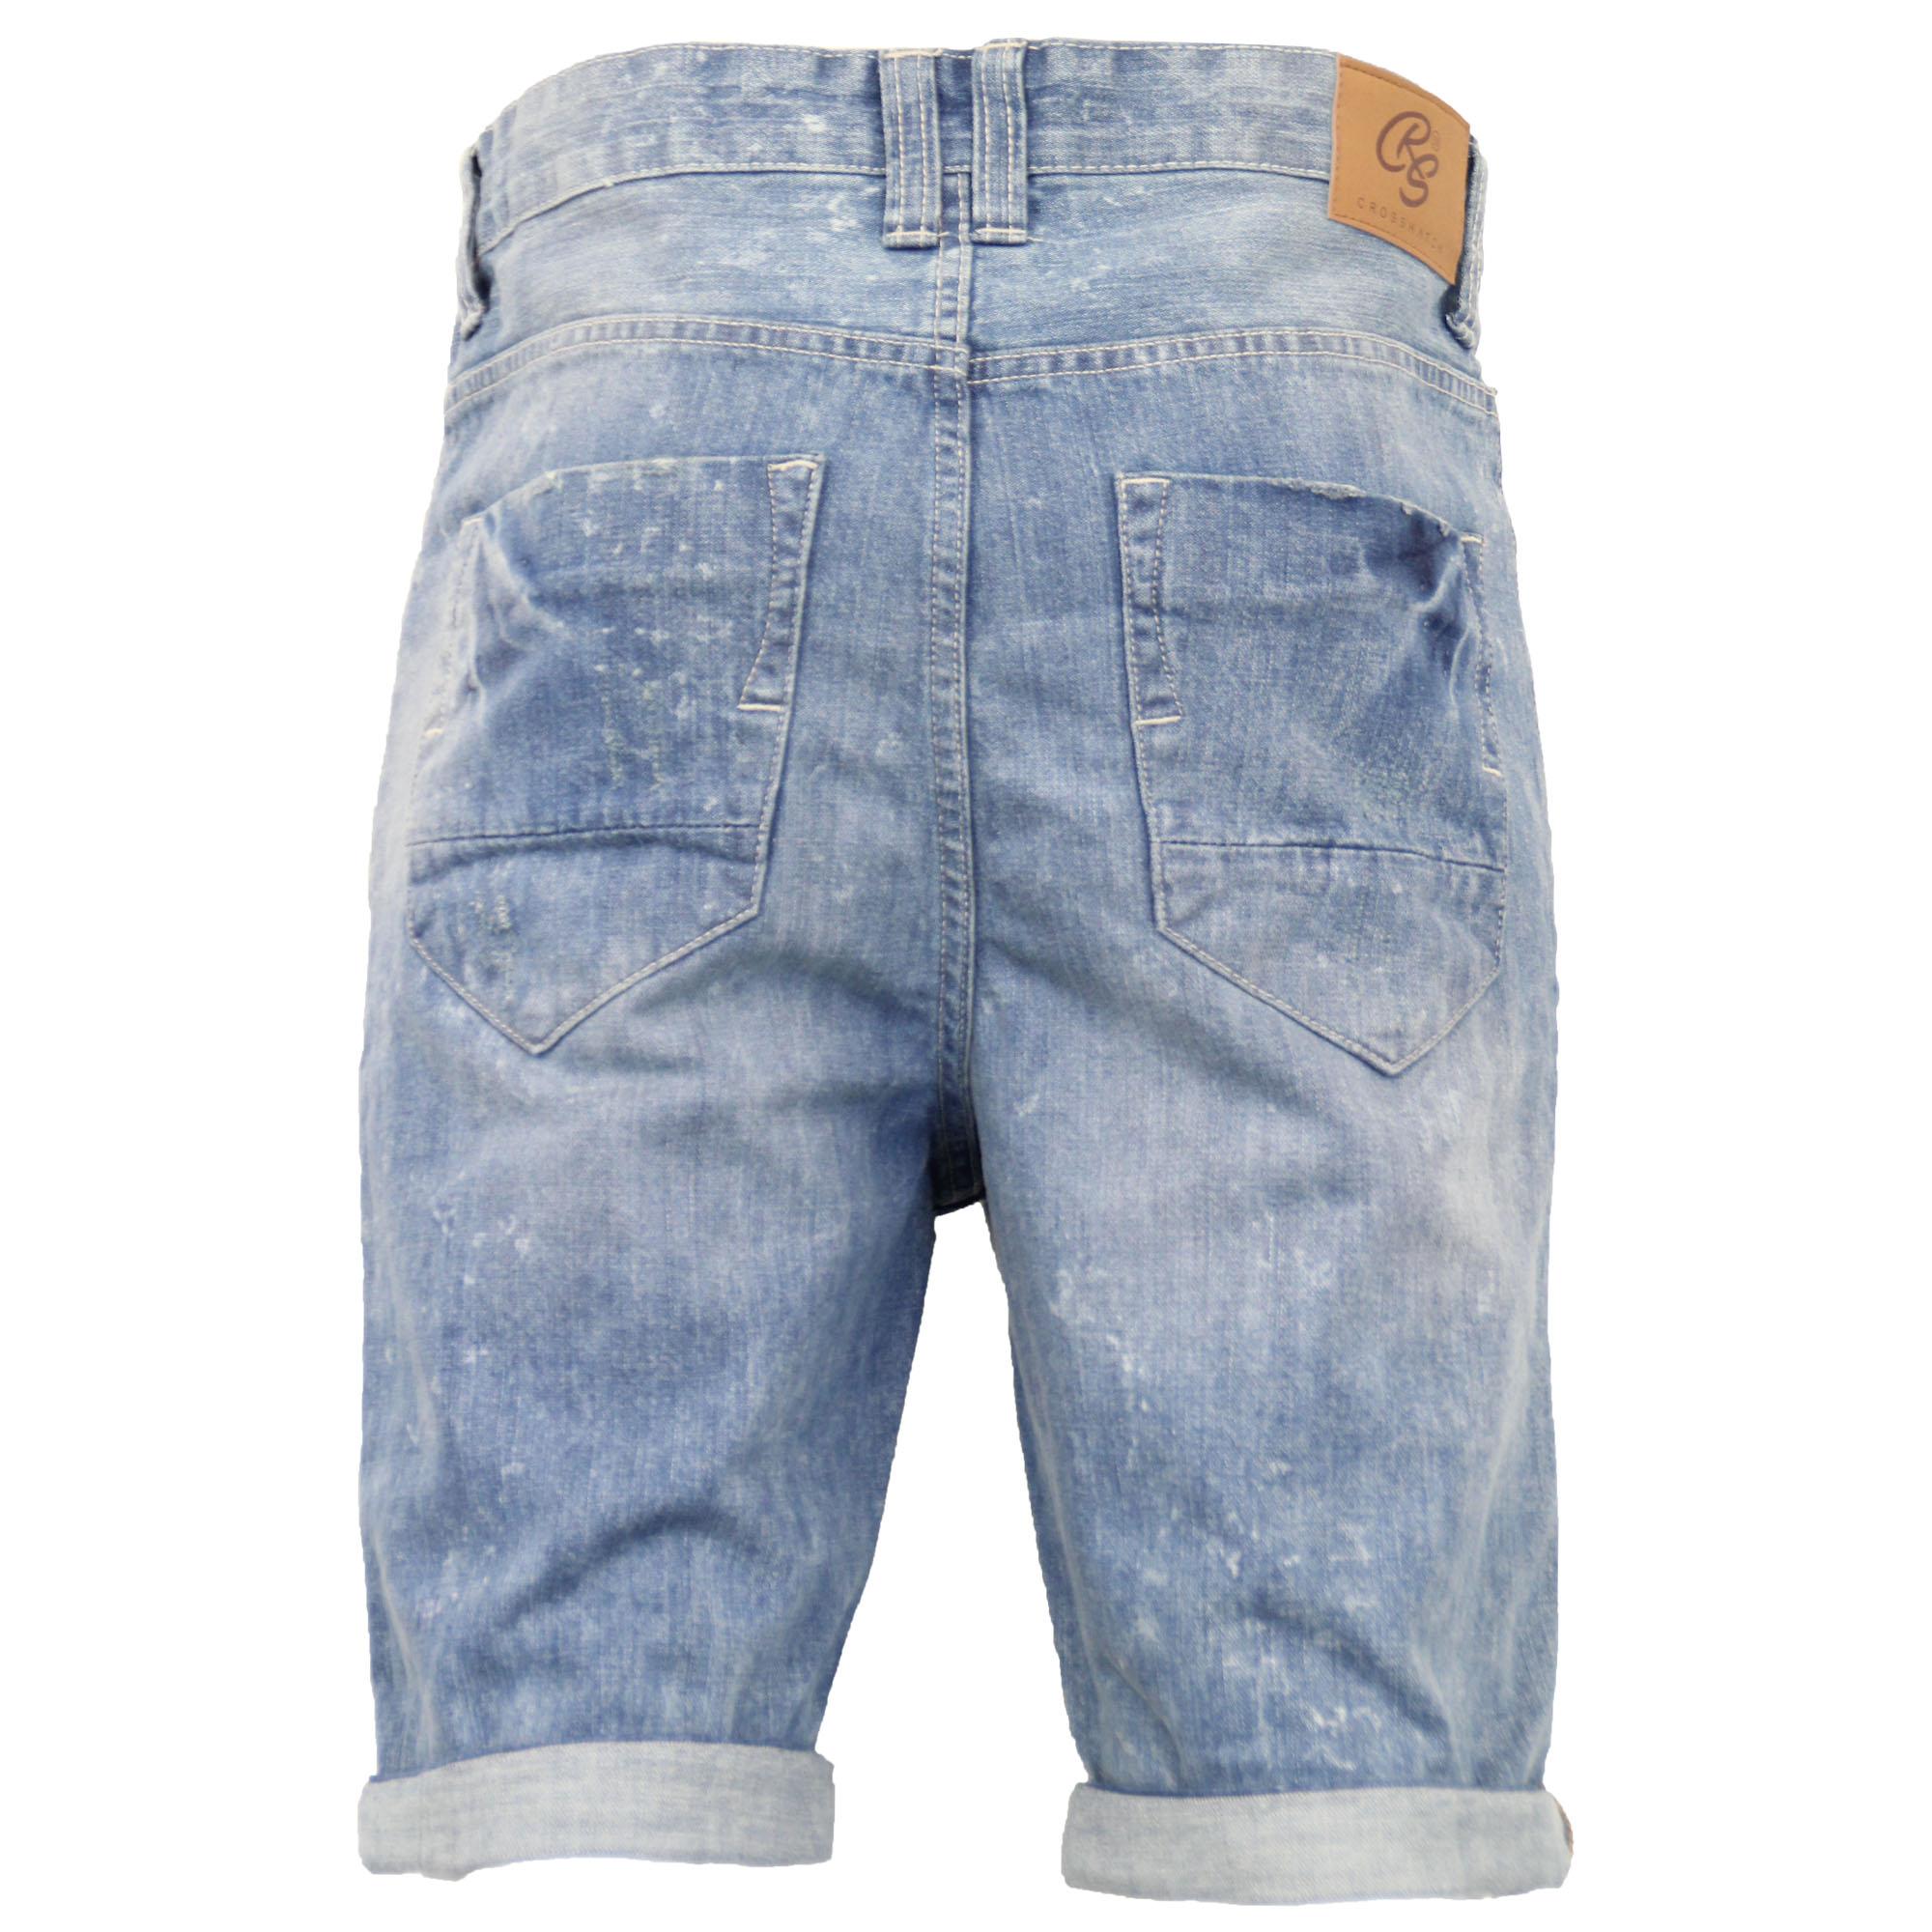 Mens-Crosshatch-Denim-Knee-Length-Combat-Shorts-Cargo-Casual-Fashion-Summer-New 縮圖 49